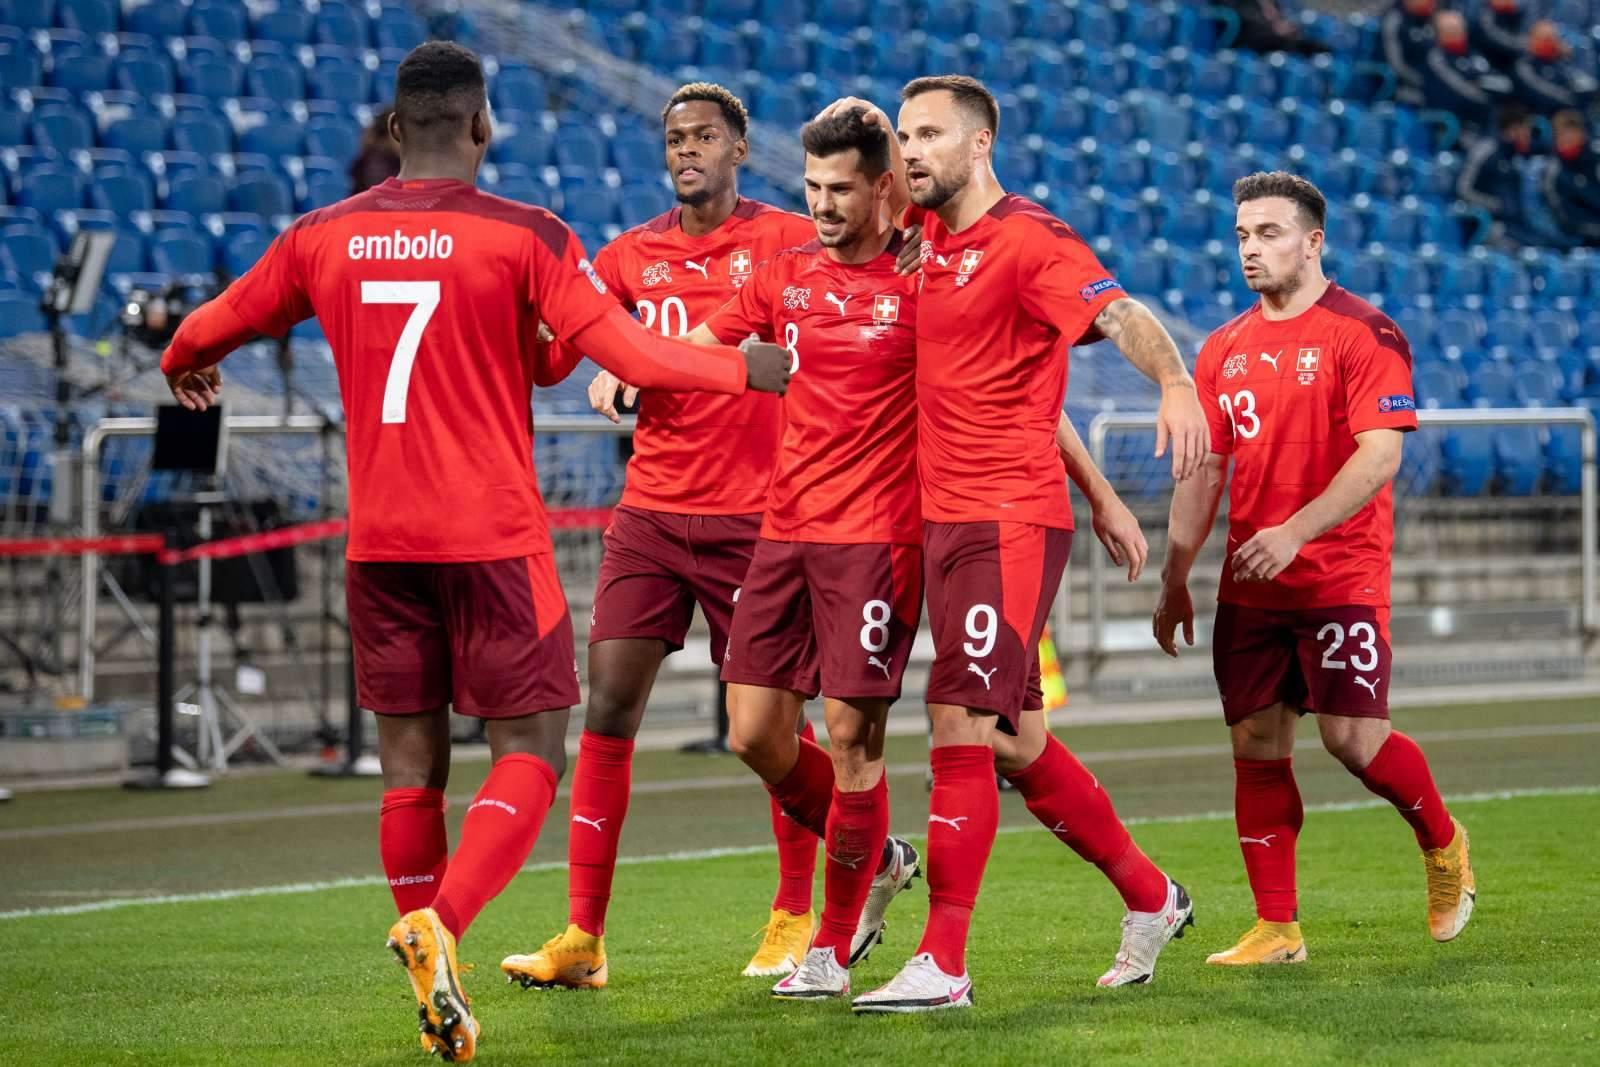 Швейцария - Турция - 3:1 (завершён)